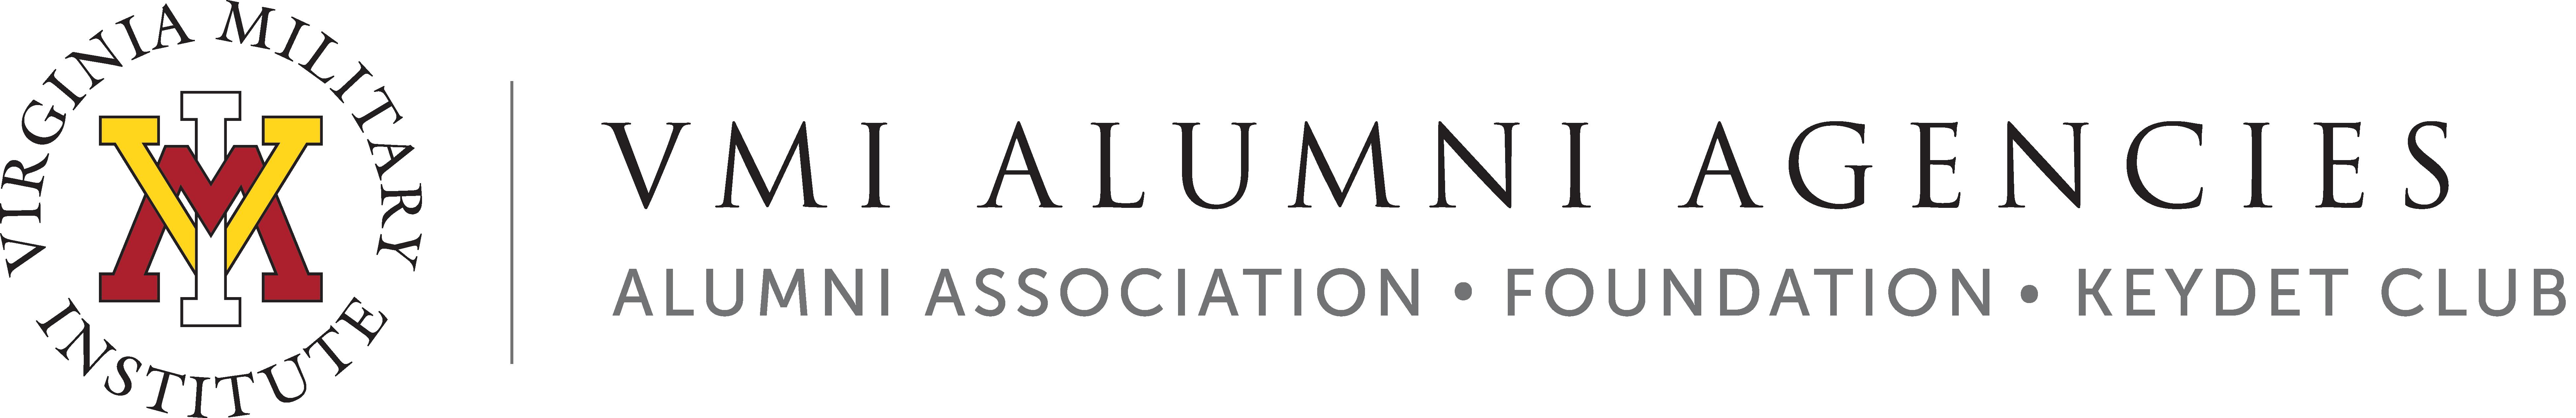 vmi-alumni